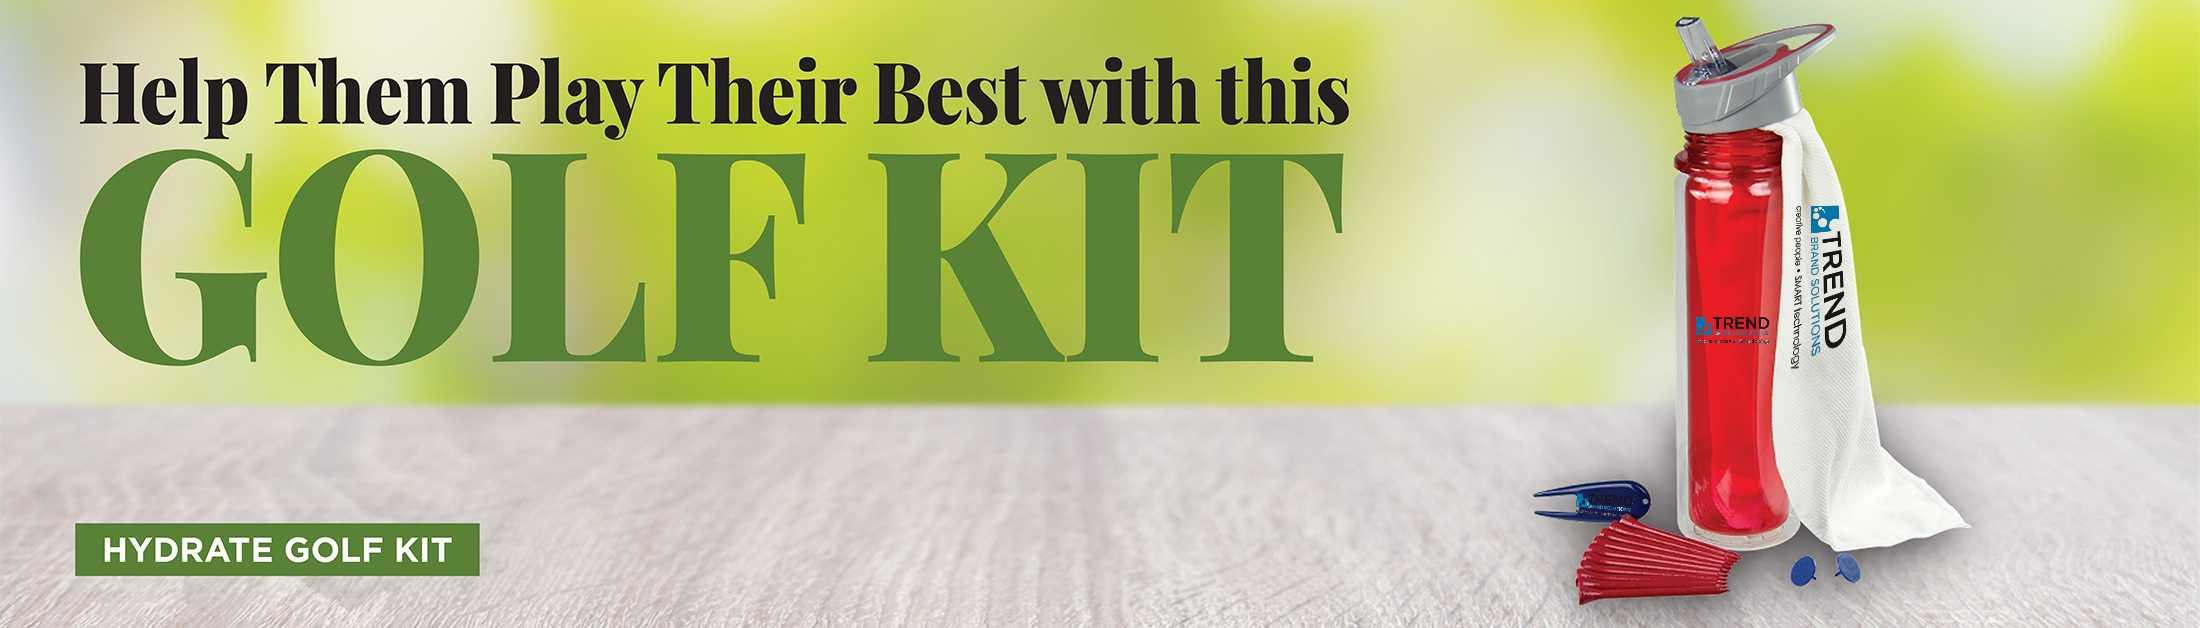 Hydrate Golf Kit AIM